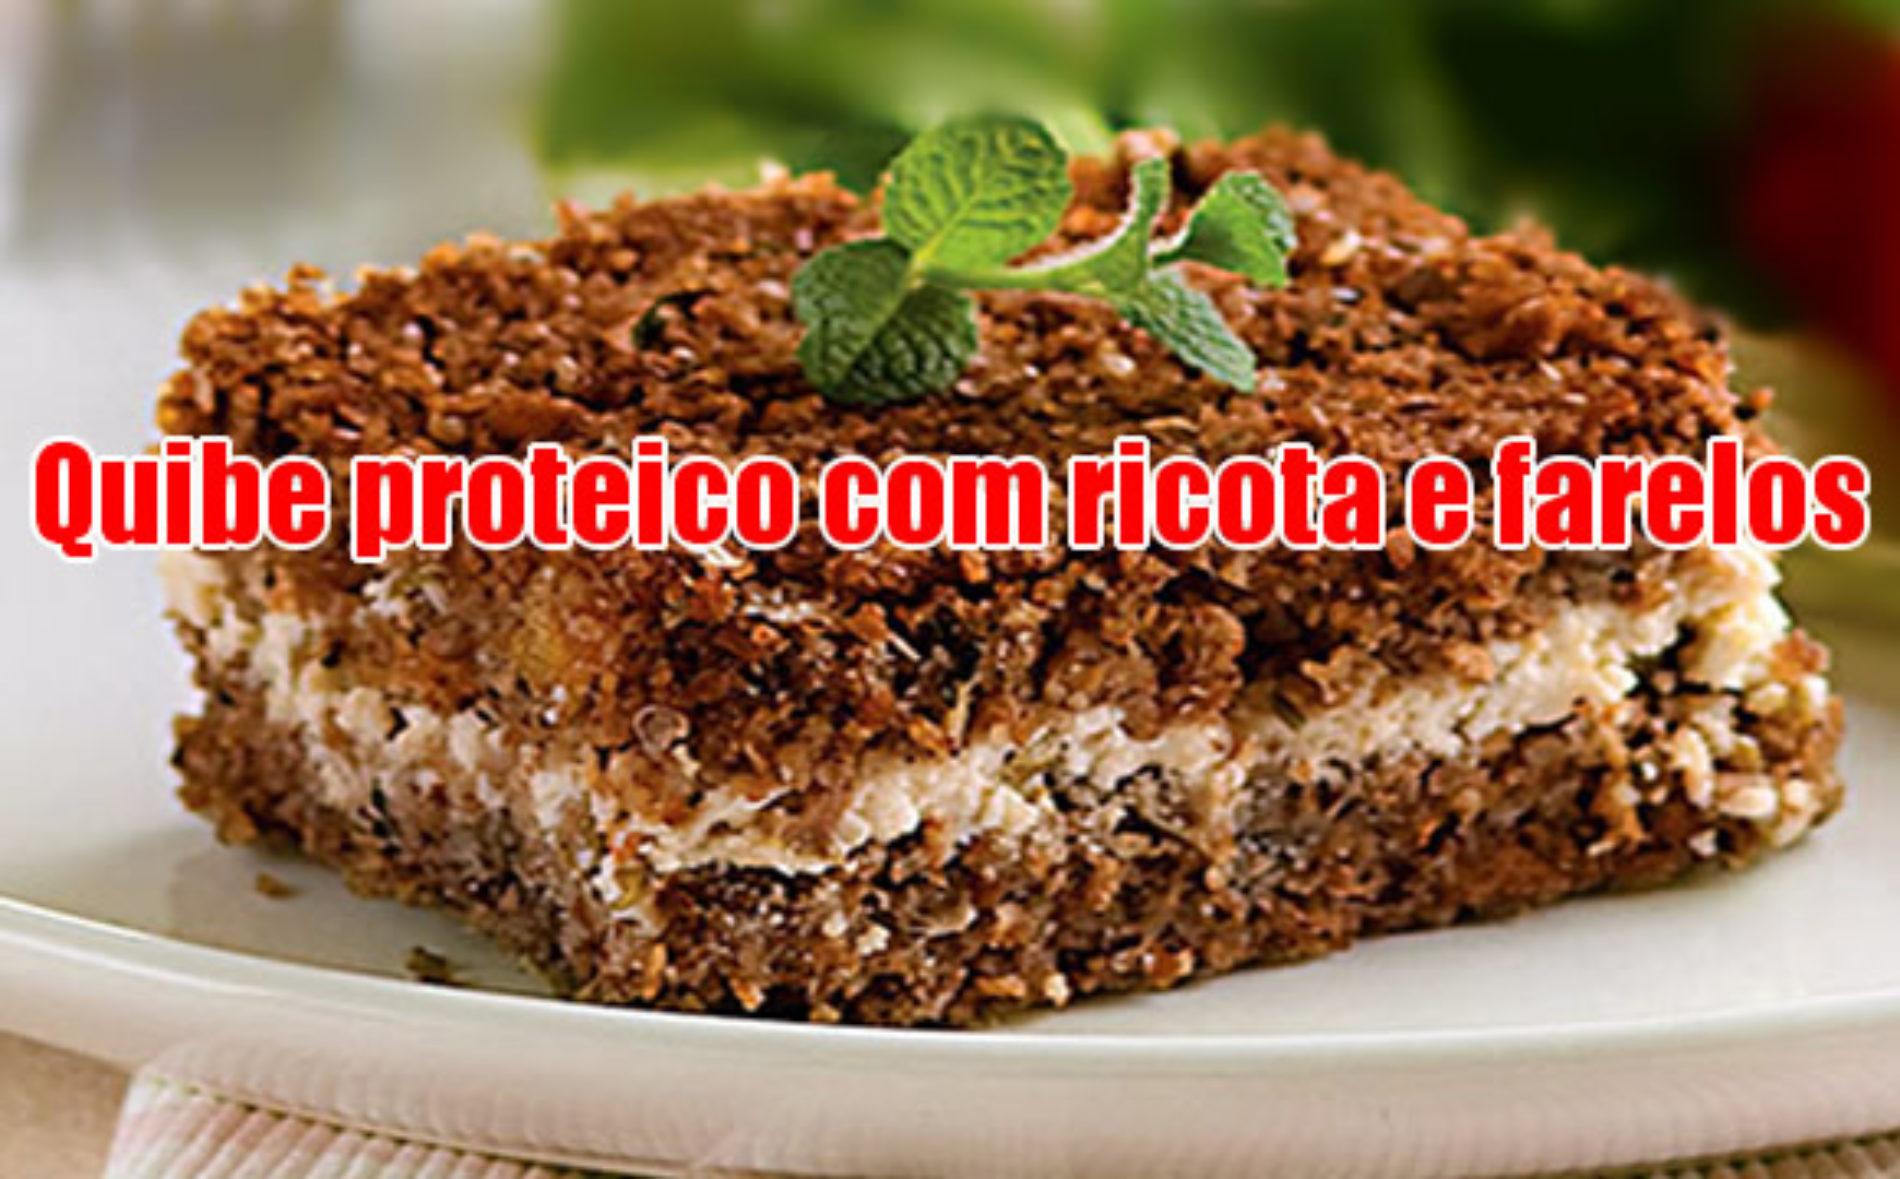 Quibe proteico Dukan com ricota e farelos